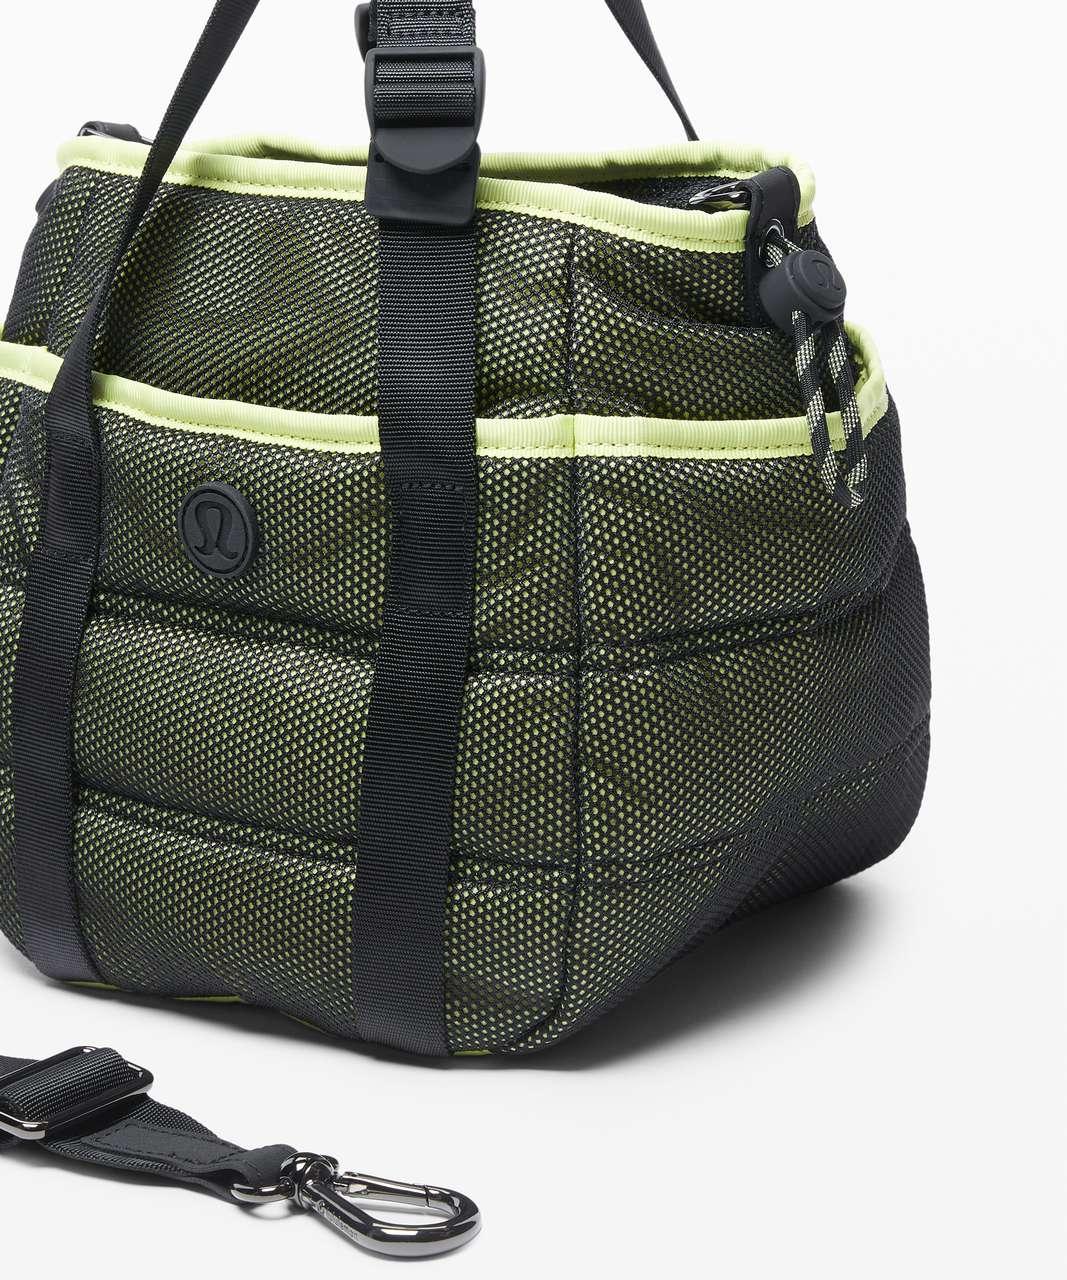 Lululemon Dash All Day Bucket Bag *6.5L - Black / Lemon Vibe